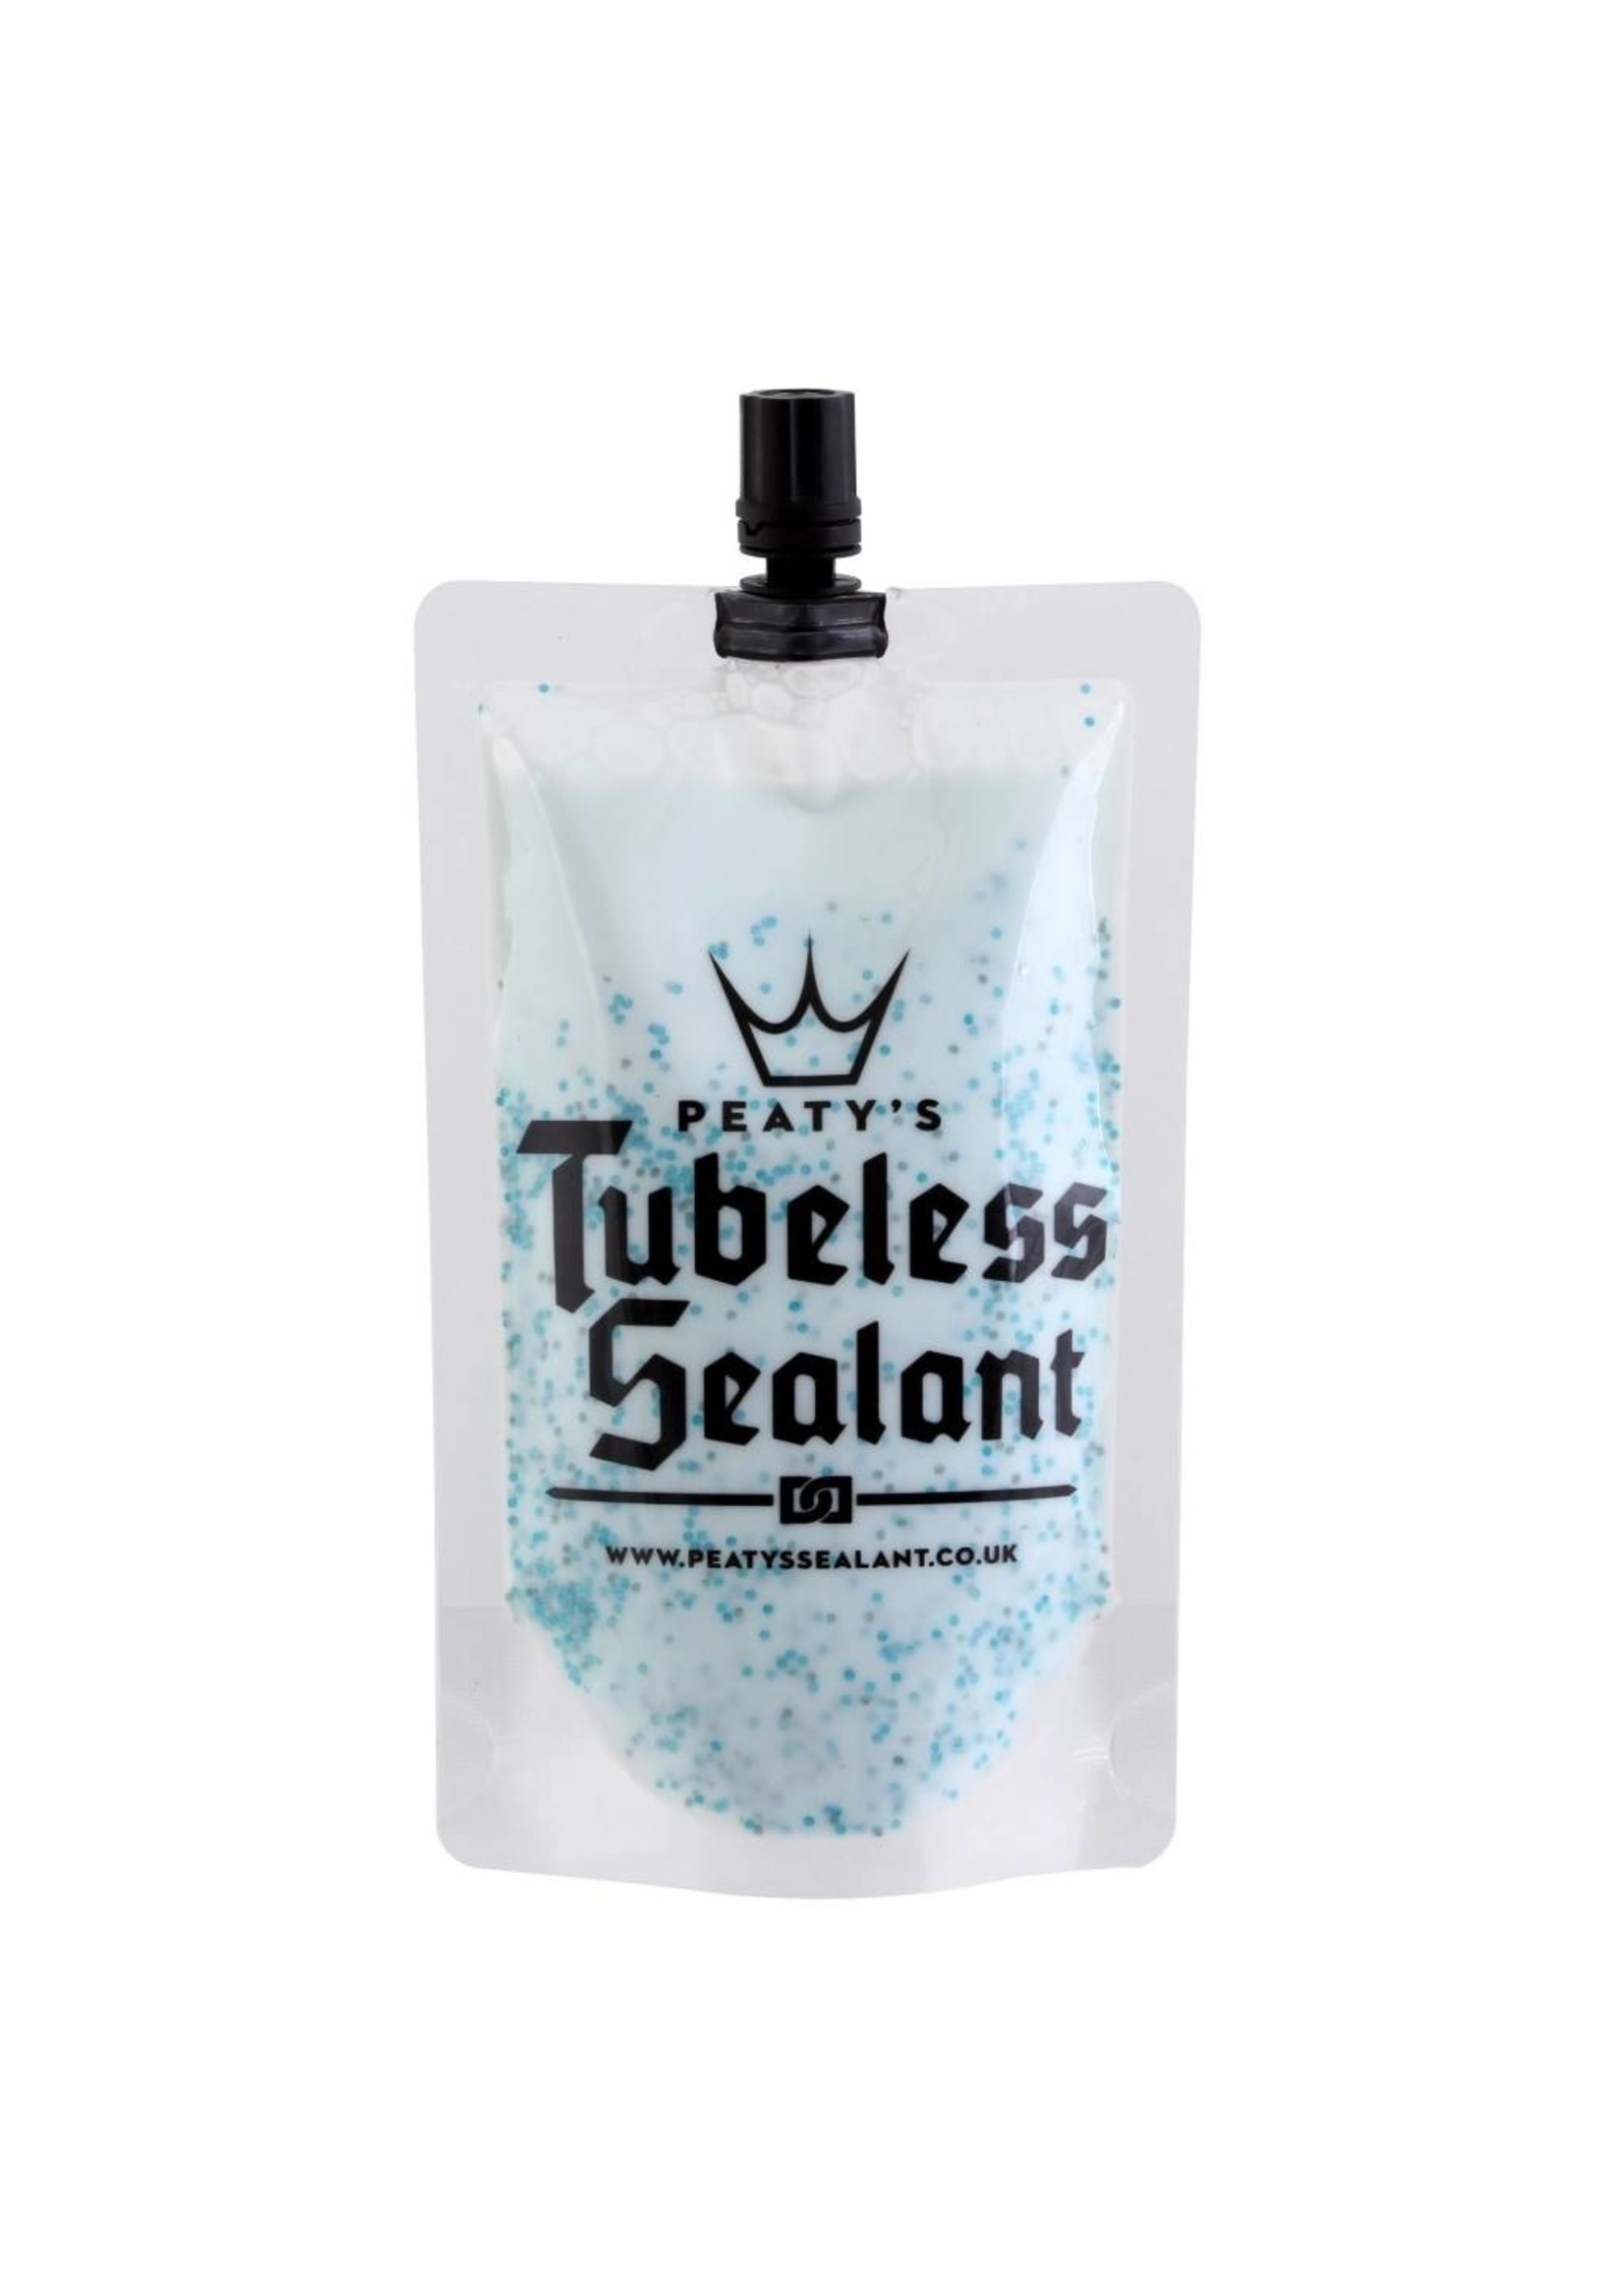 Peaty's tubeless Sealant trail pouch 120ml